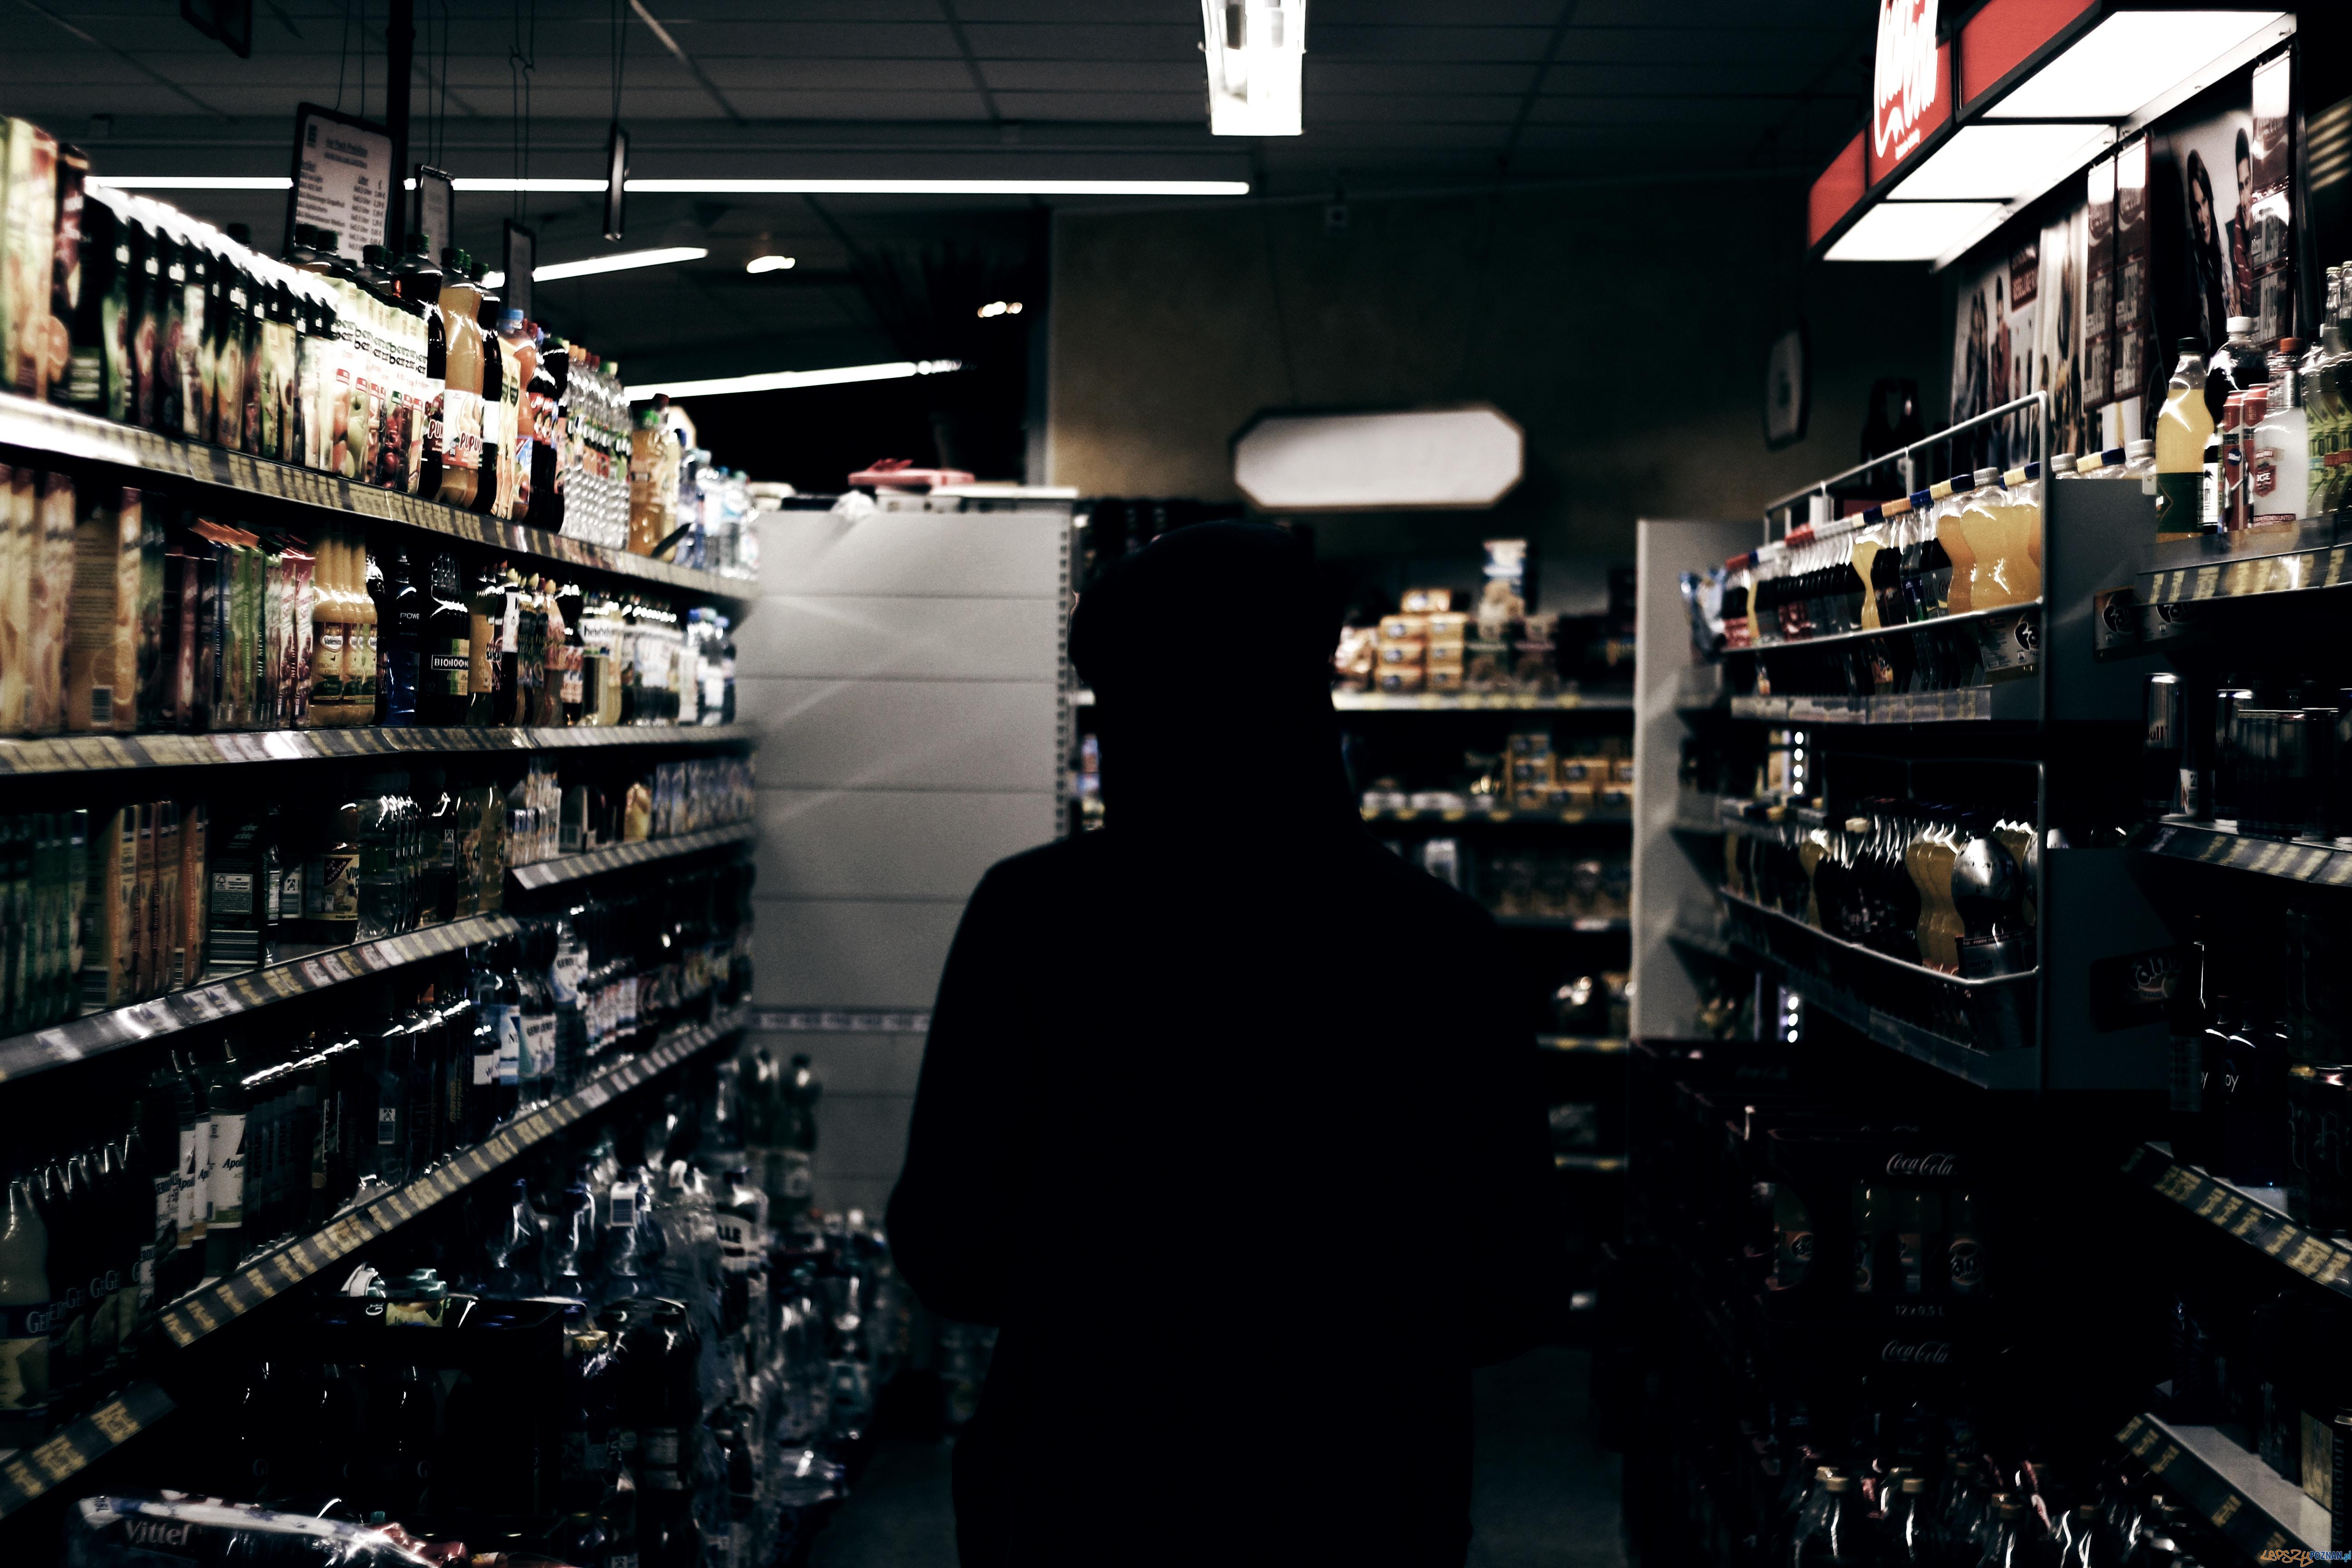 sklep alkohole  Foto: Tom Sodoge